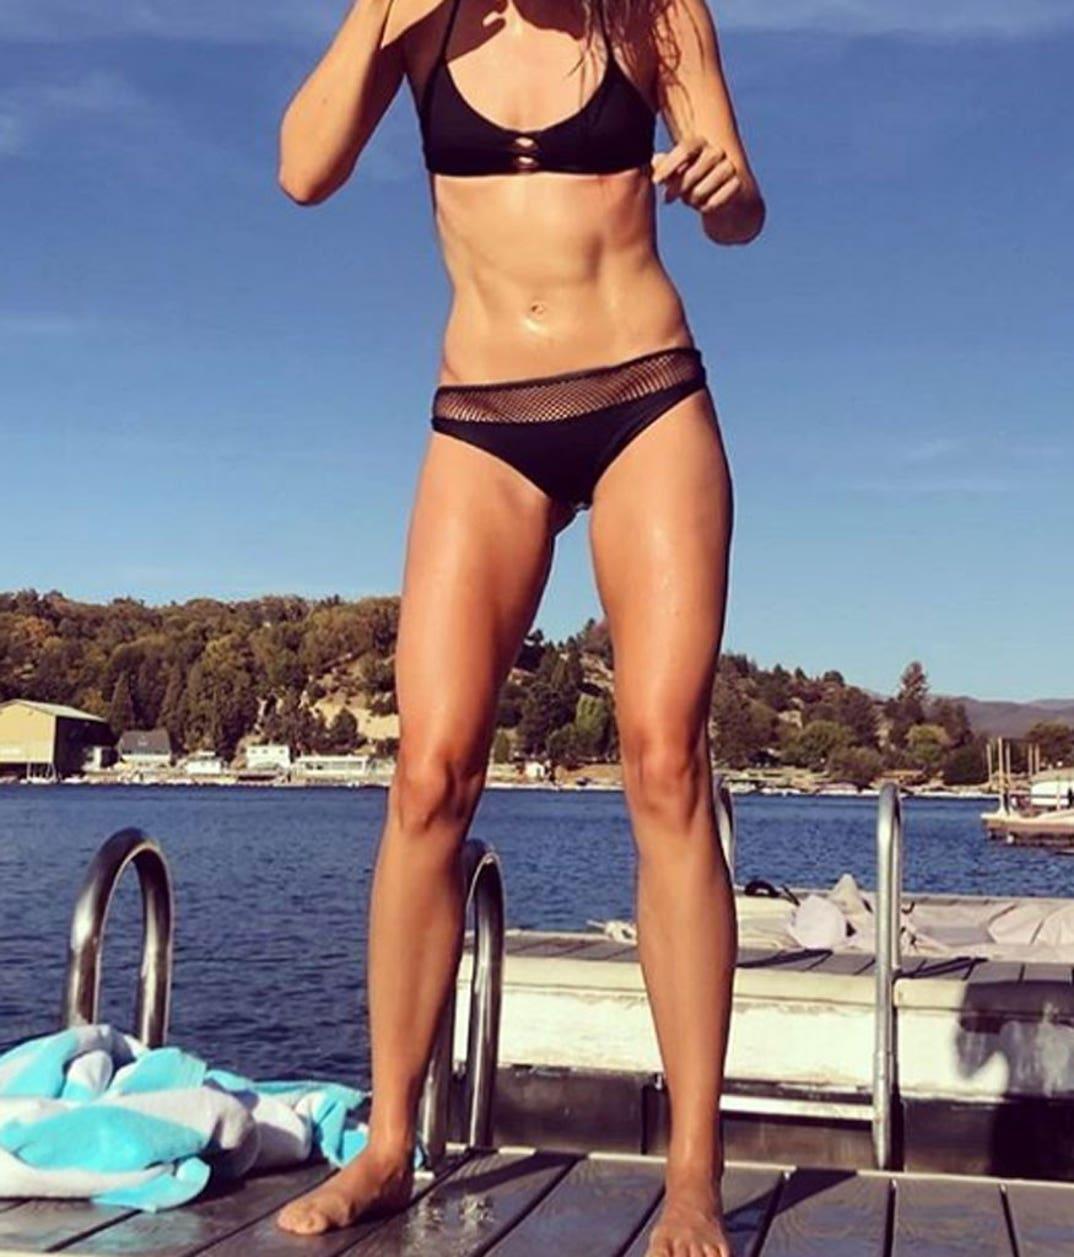 Joey King Hot celebrity bikini bods -- guess who!